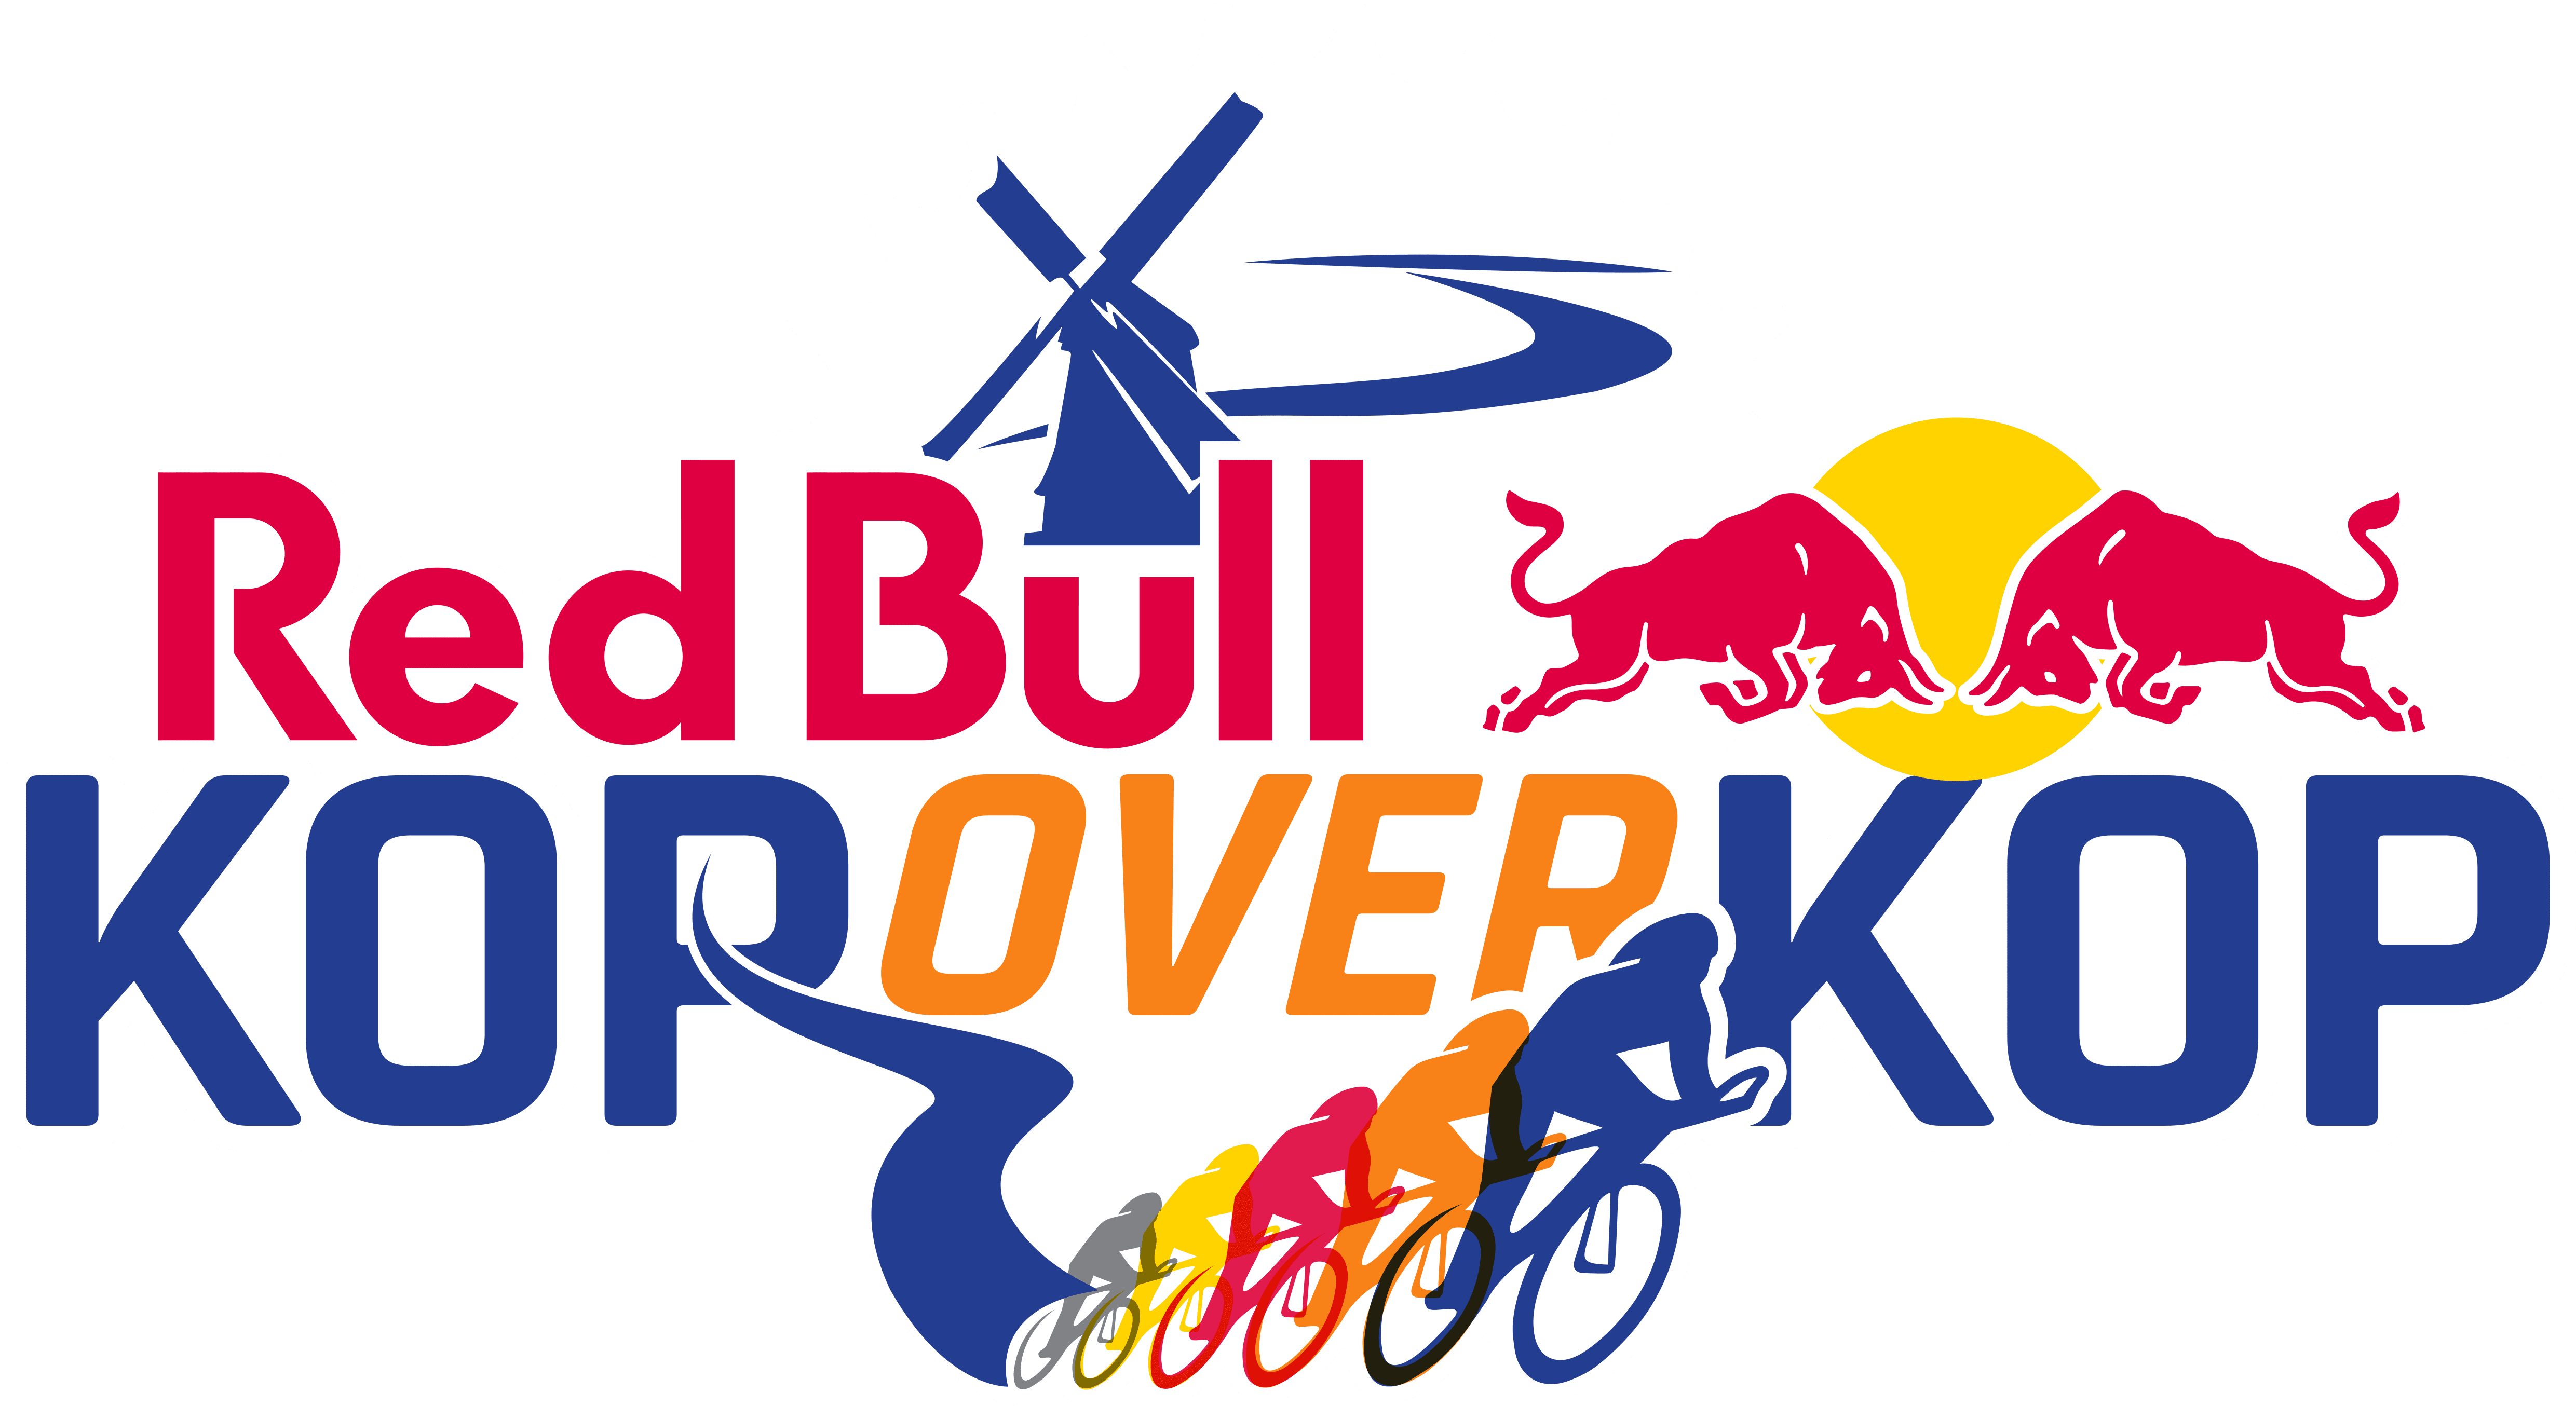 Red Bull Kop over Kop